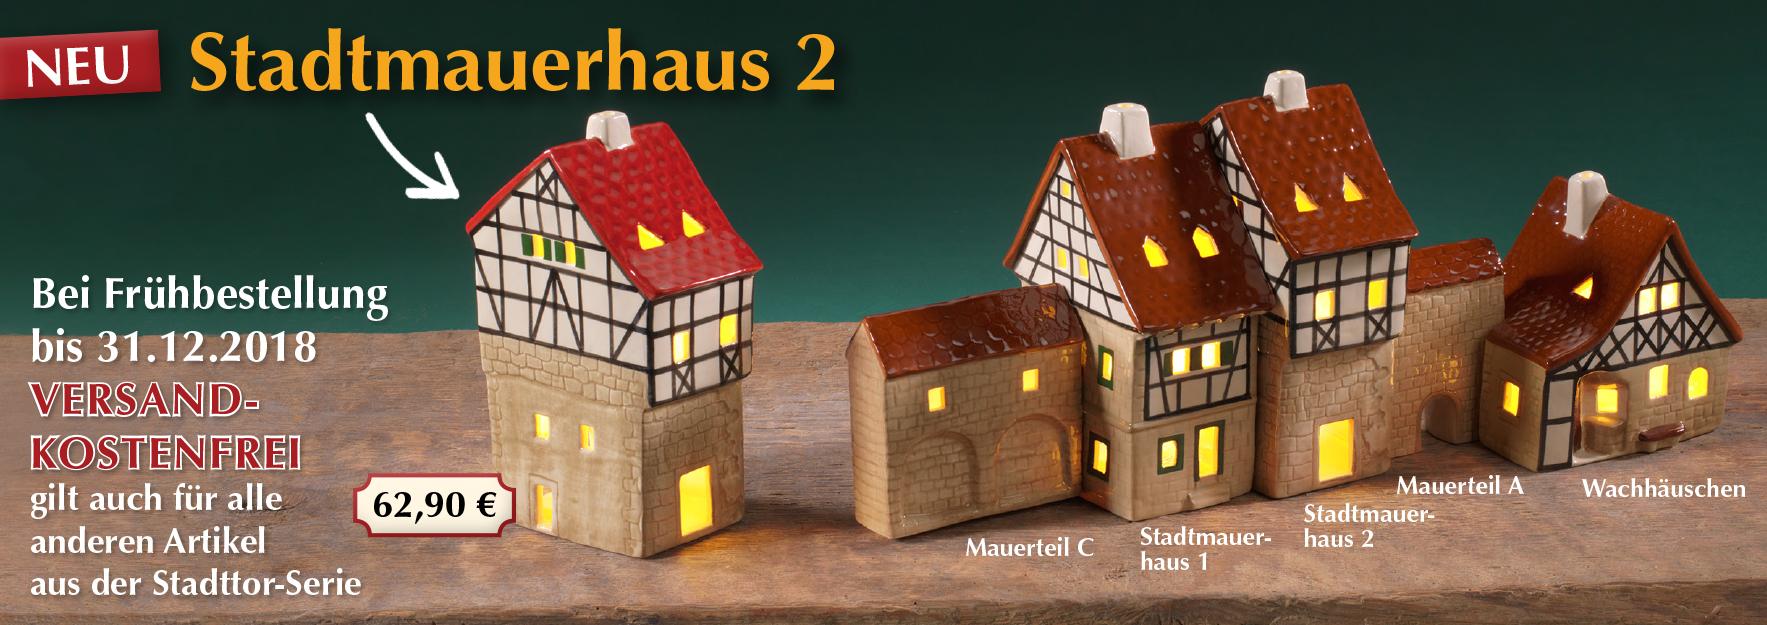 NEU: Stadtmauerhaus 2